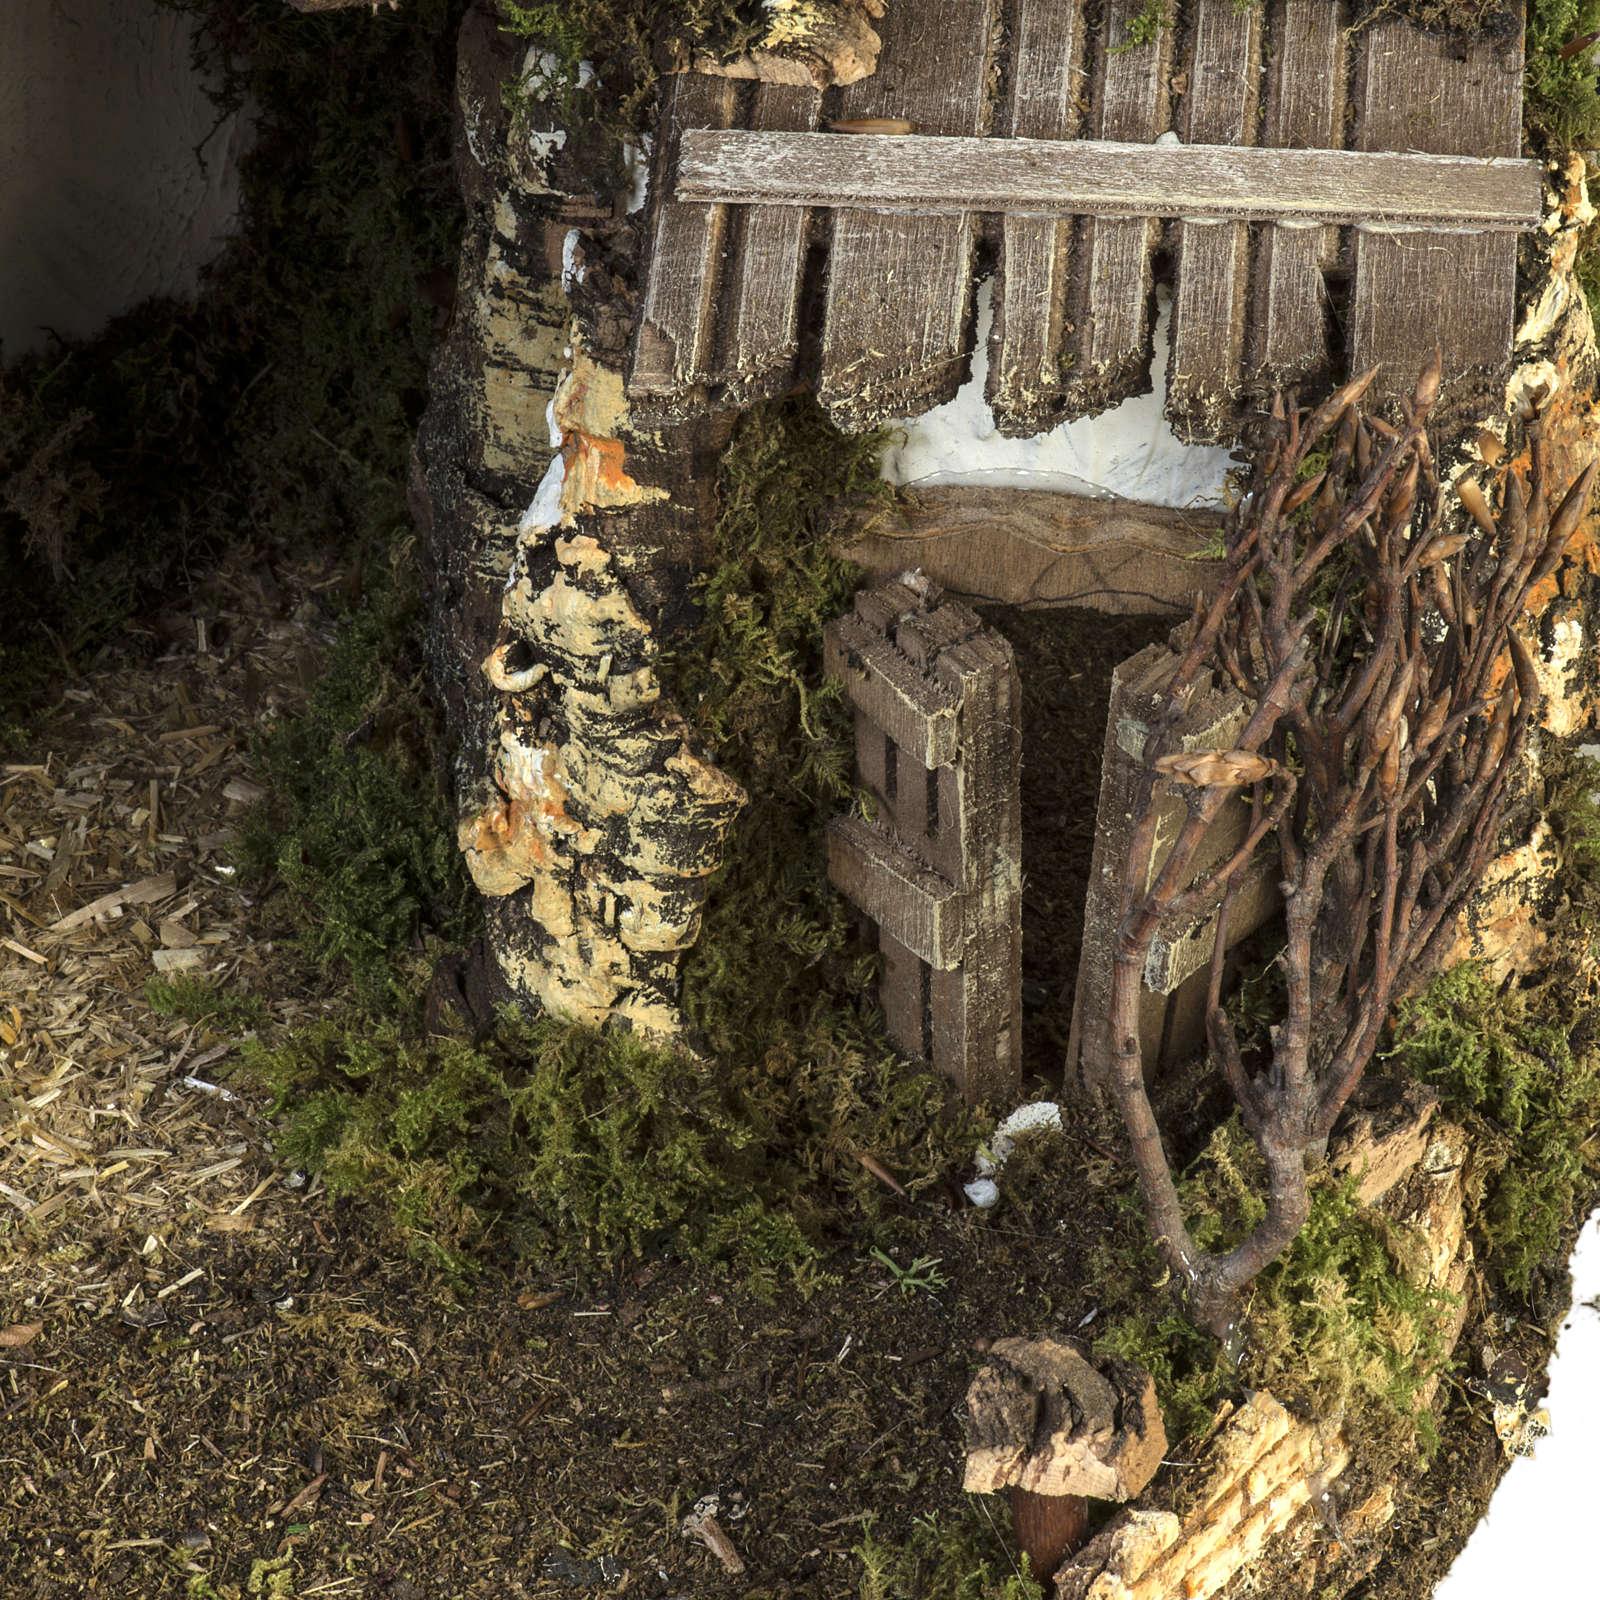 Capanna presepe stile baita con fontana 56x48x38 cm 4